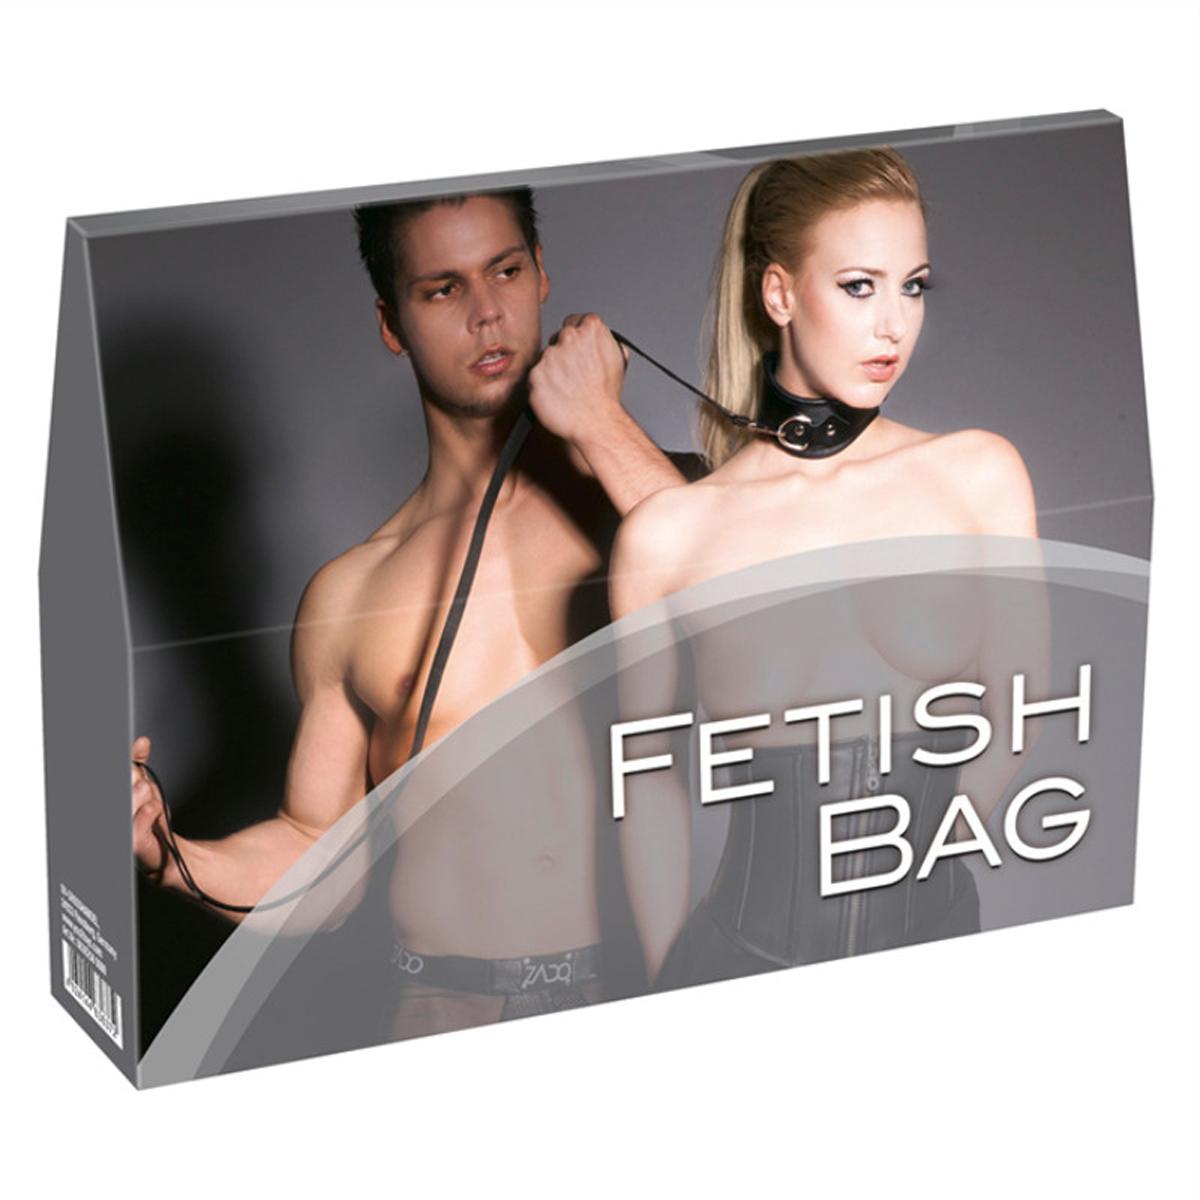 Изненадващ фетиш комплект за него и нея – Fetish Bag